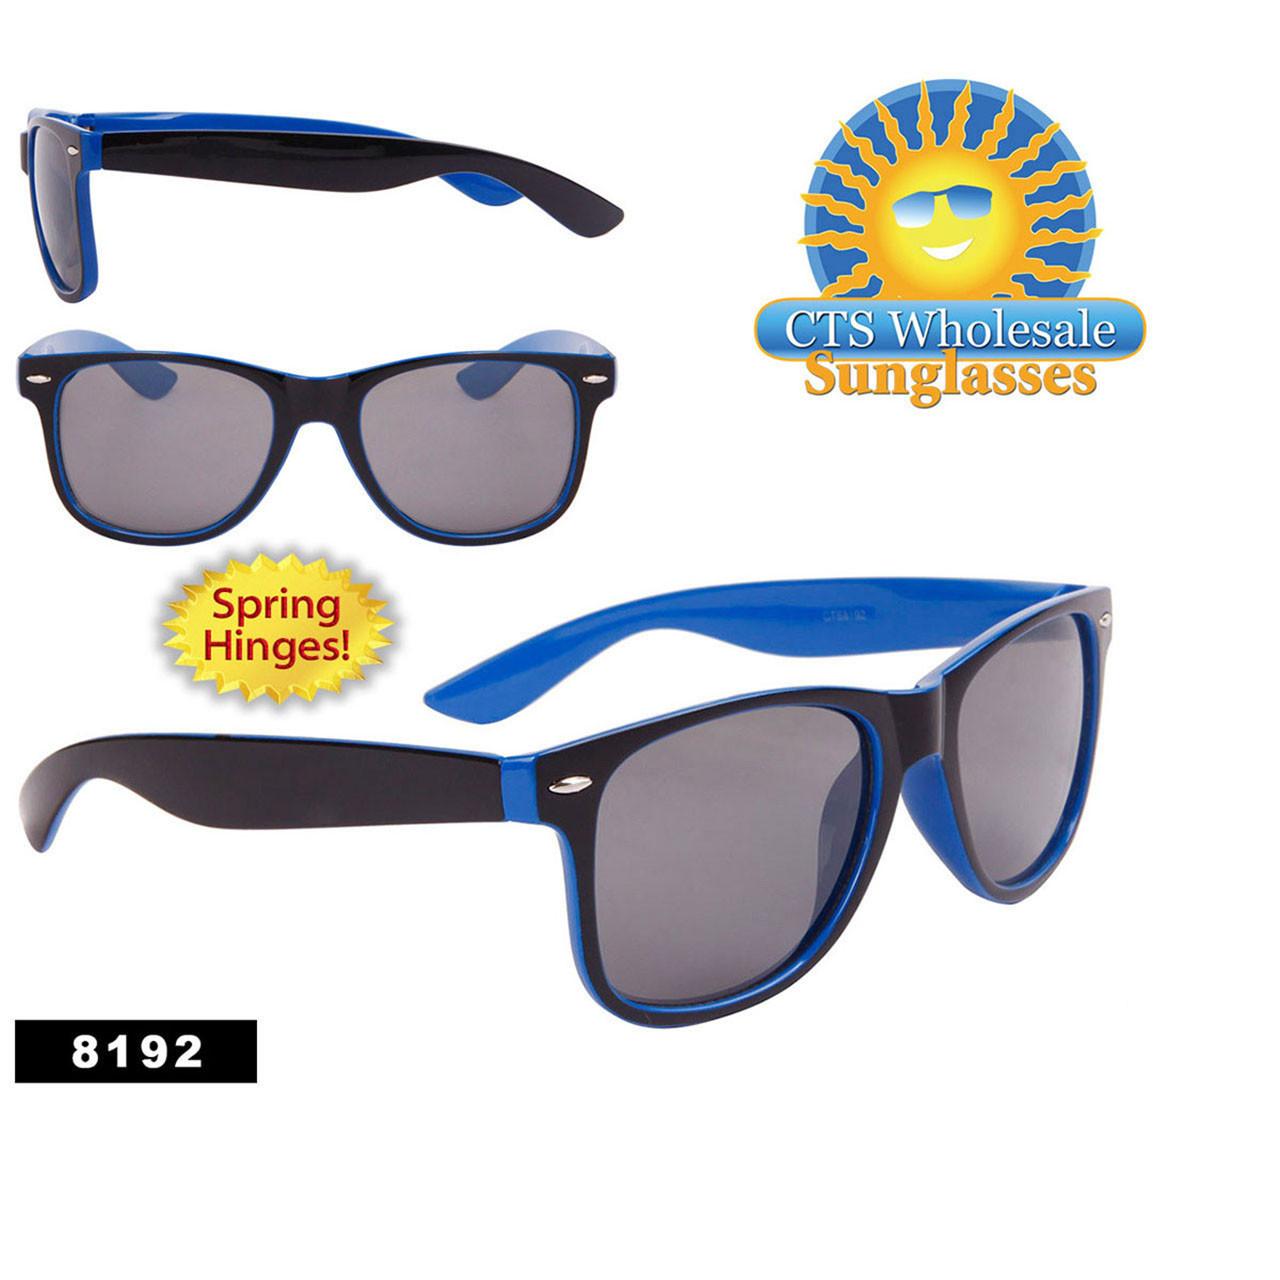 California Classics by the Dozen - Style # 8192 Spring Hinge Black/Blue